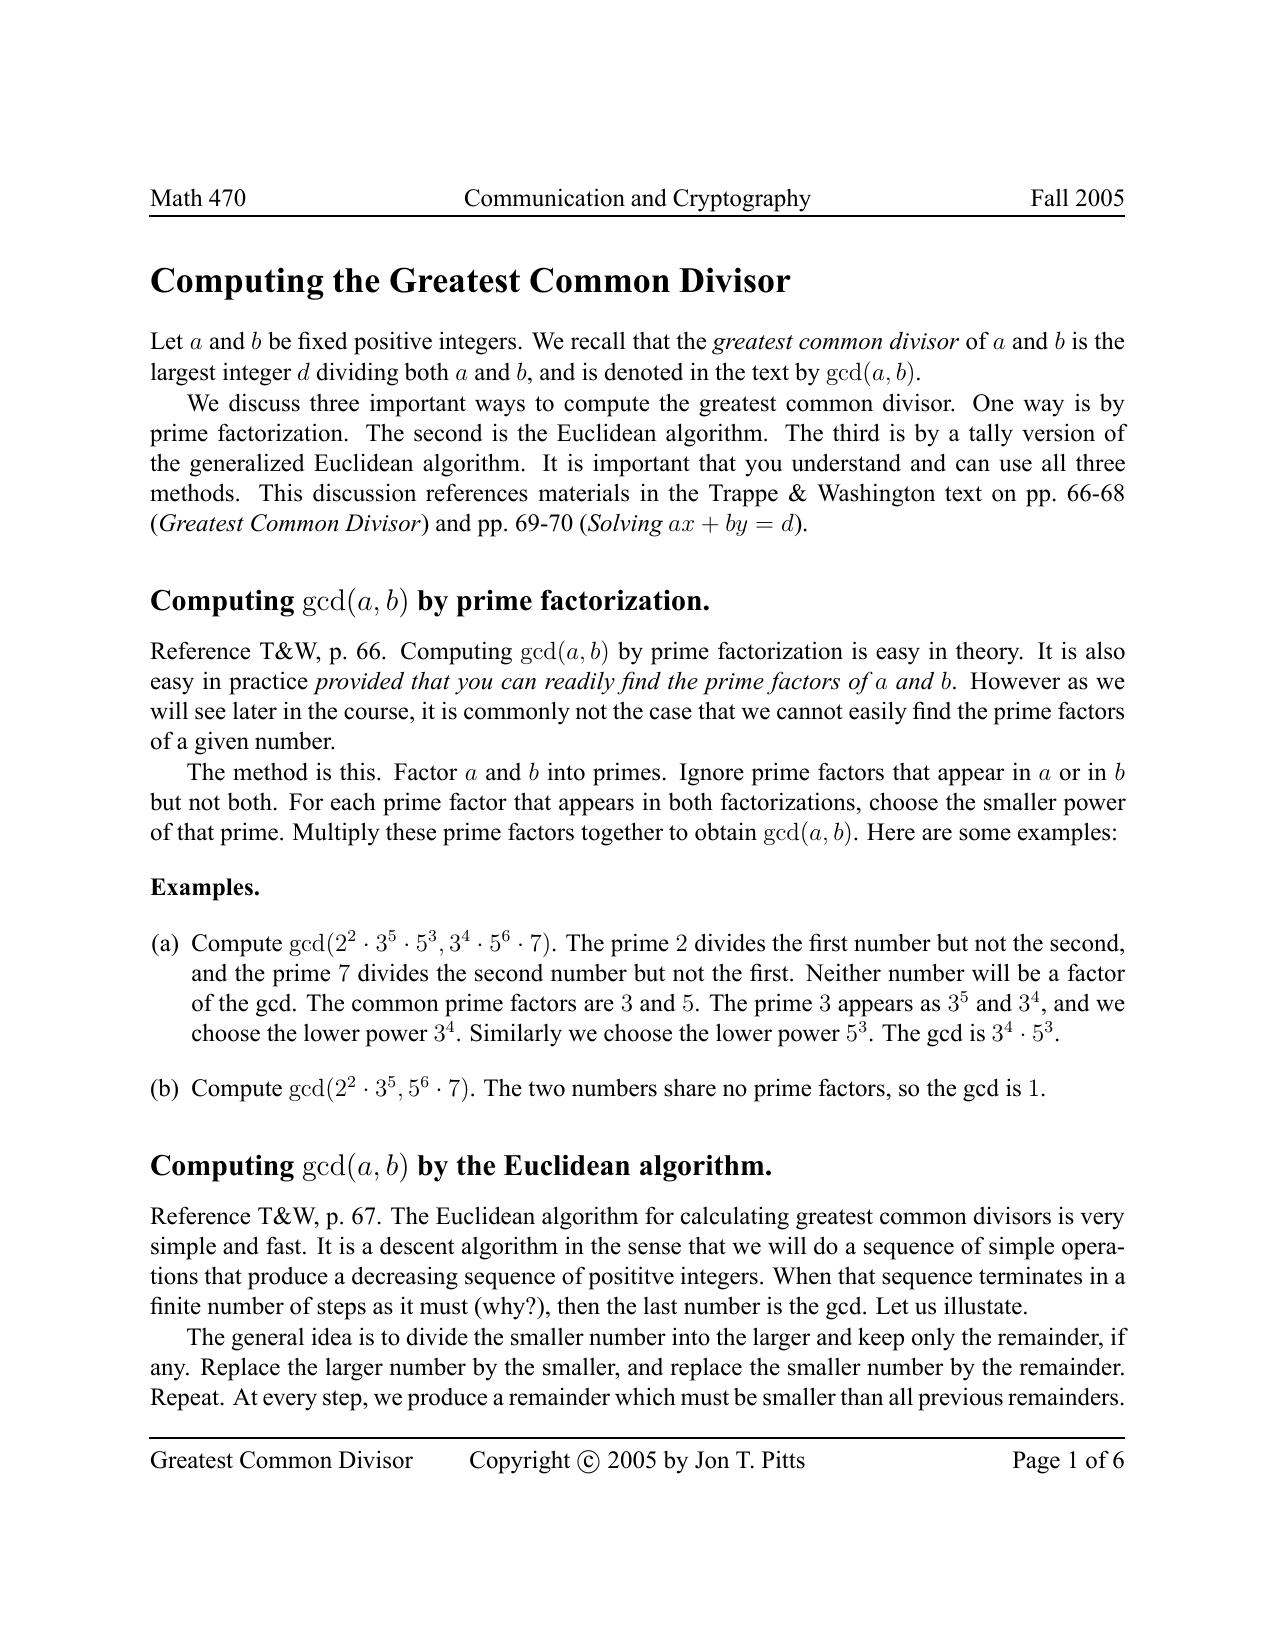 Computing the Greatest Common Divisor